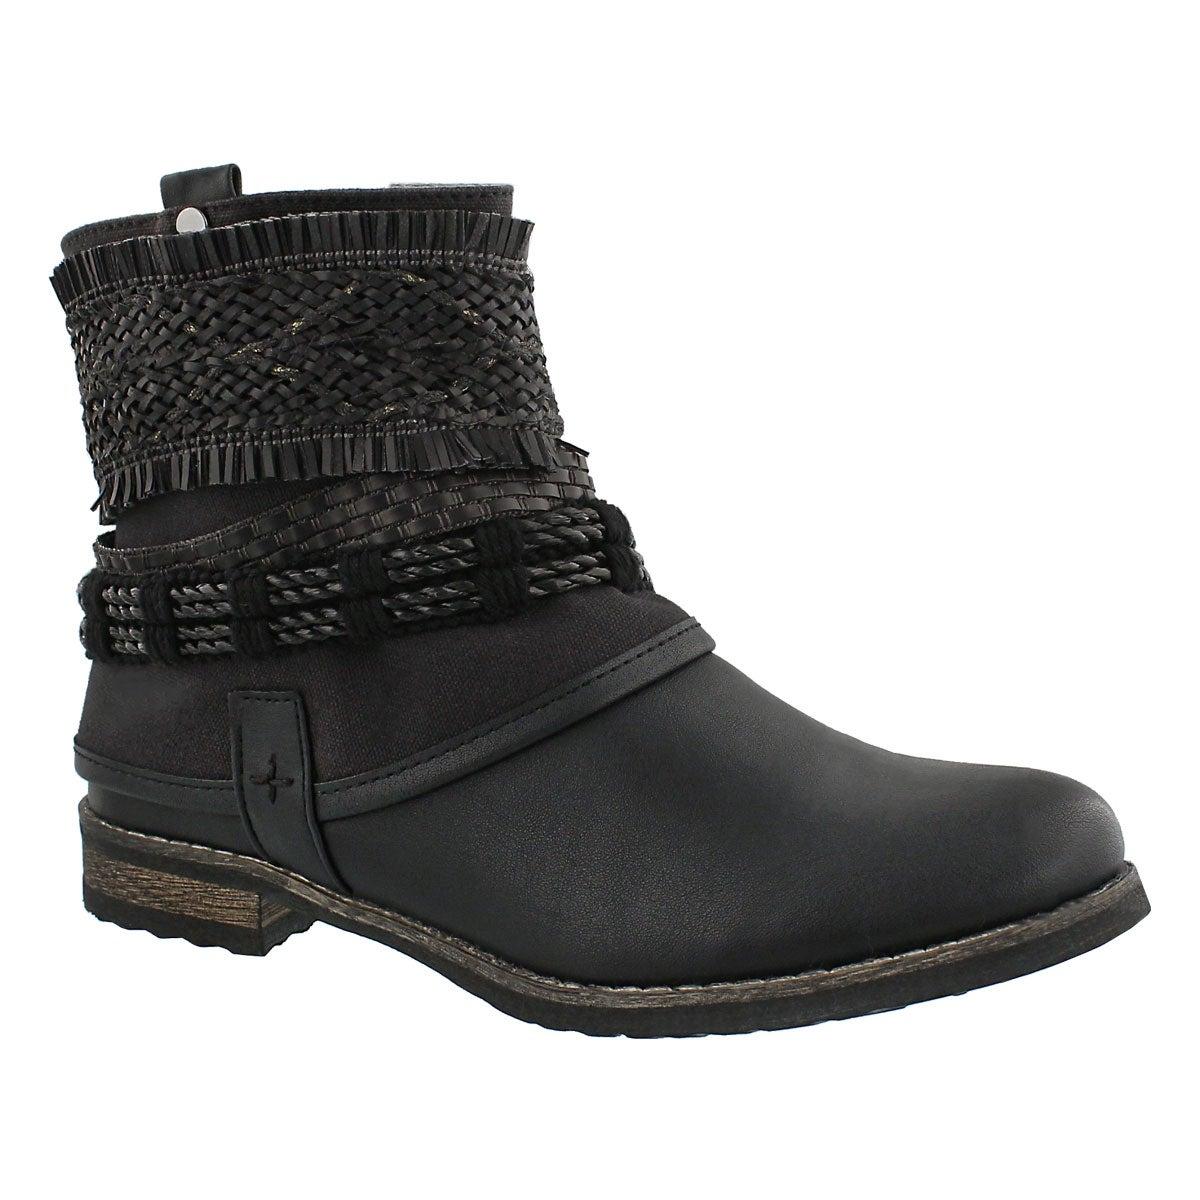 Women's BIZOU 2 black casual ankle boots